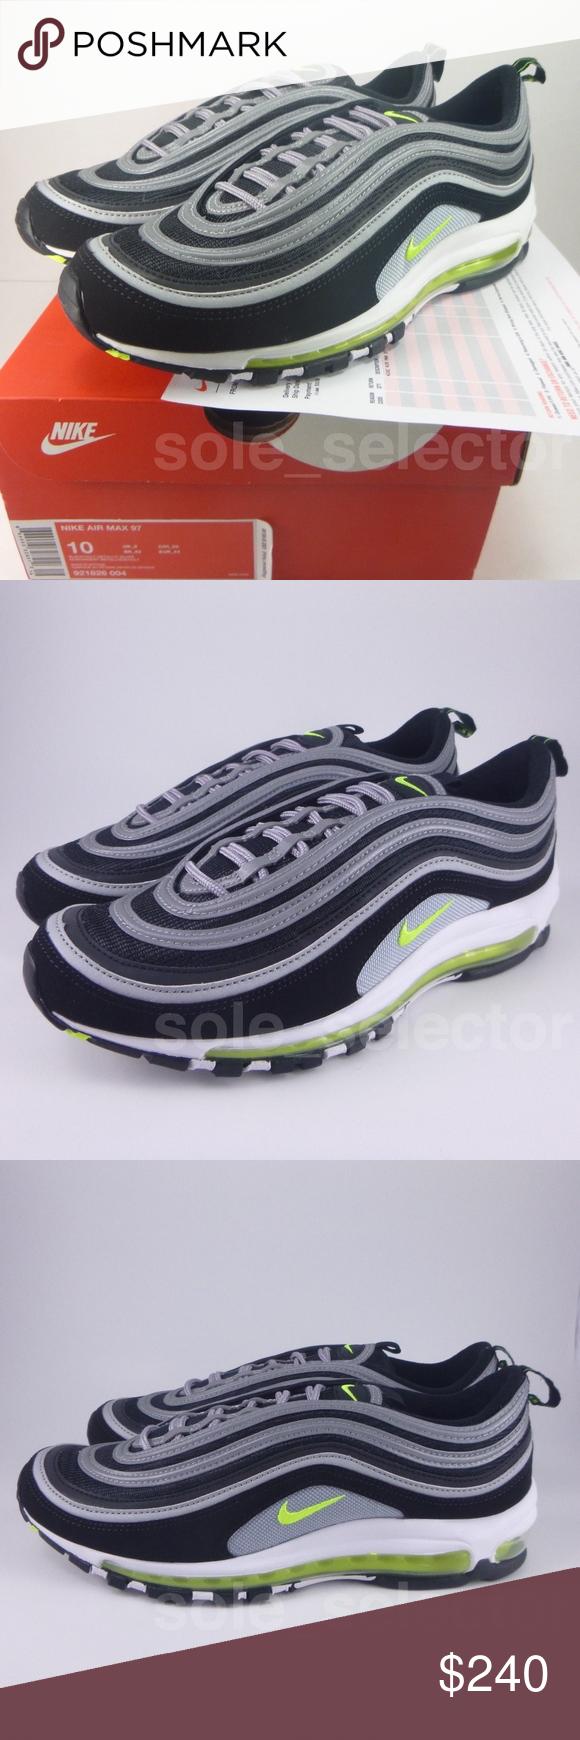 NWT Nike Air Max 97 OG QS Volt JAPAN 921826-004 10 Fast 1d89d0682